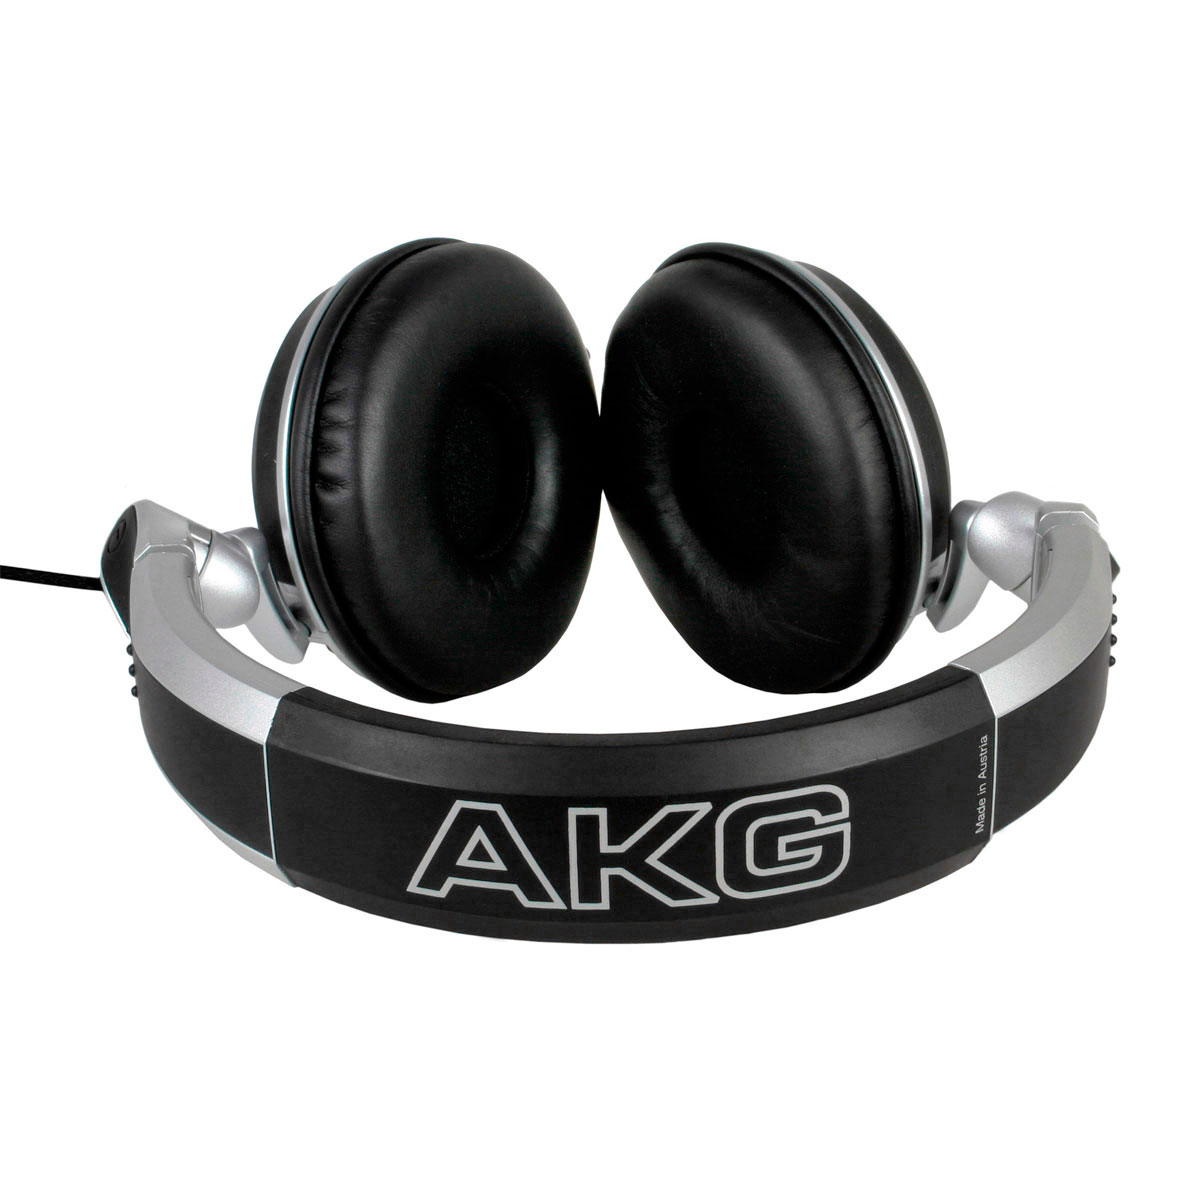 Fone de Ouvido Over-ear p/ DJ 5Hz - 30KHz 42 Ohms - K 181 DJ AKG